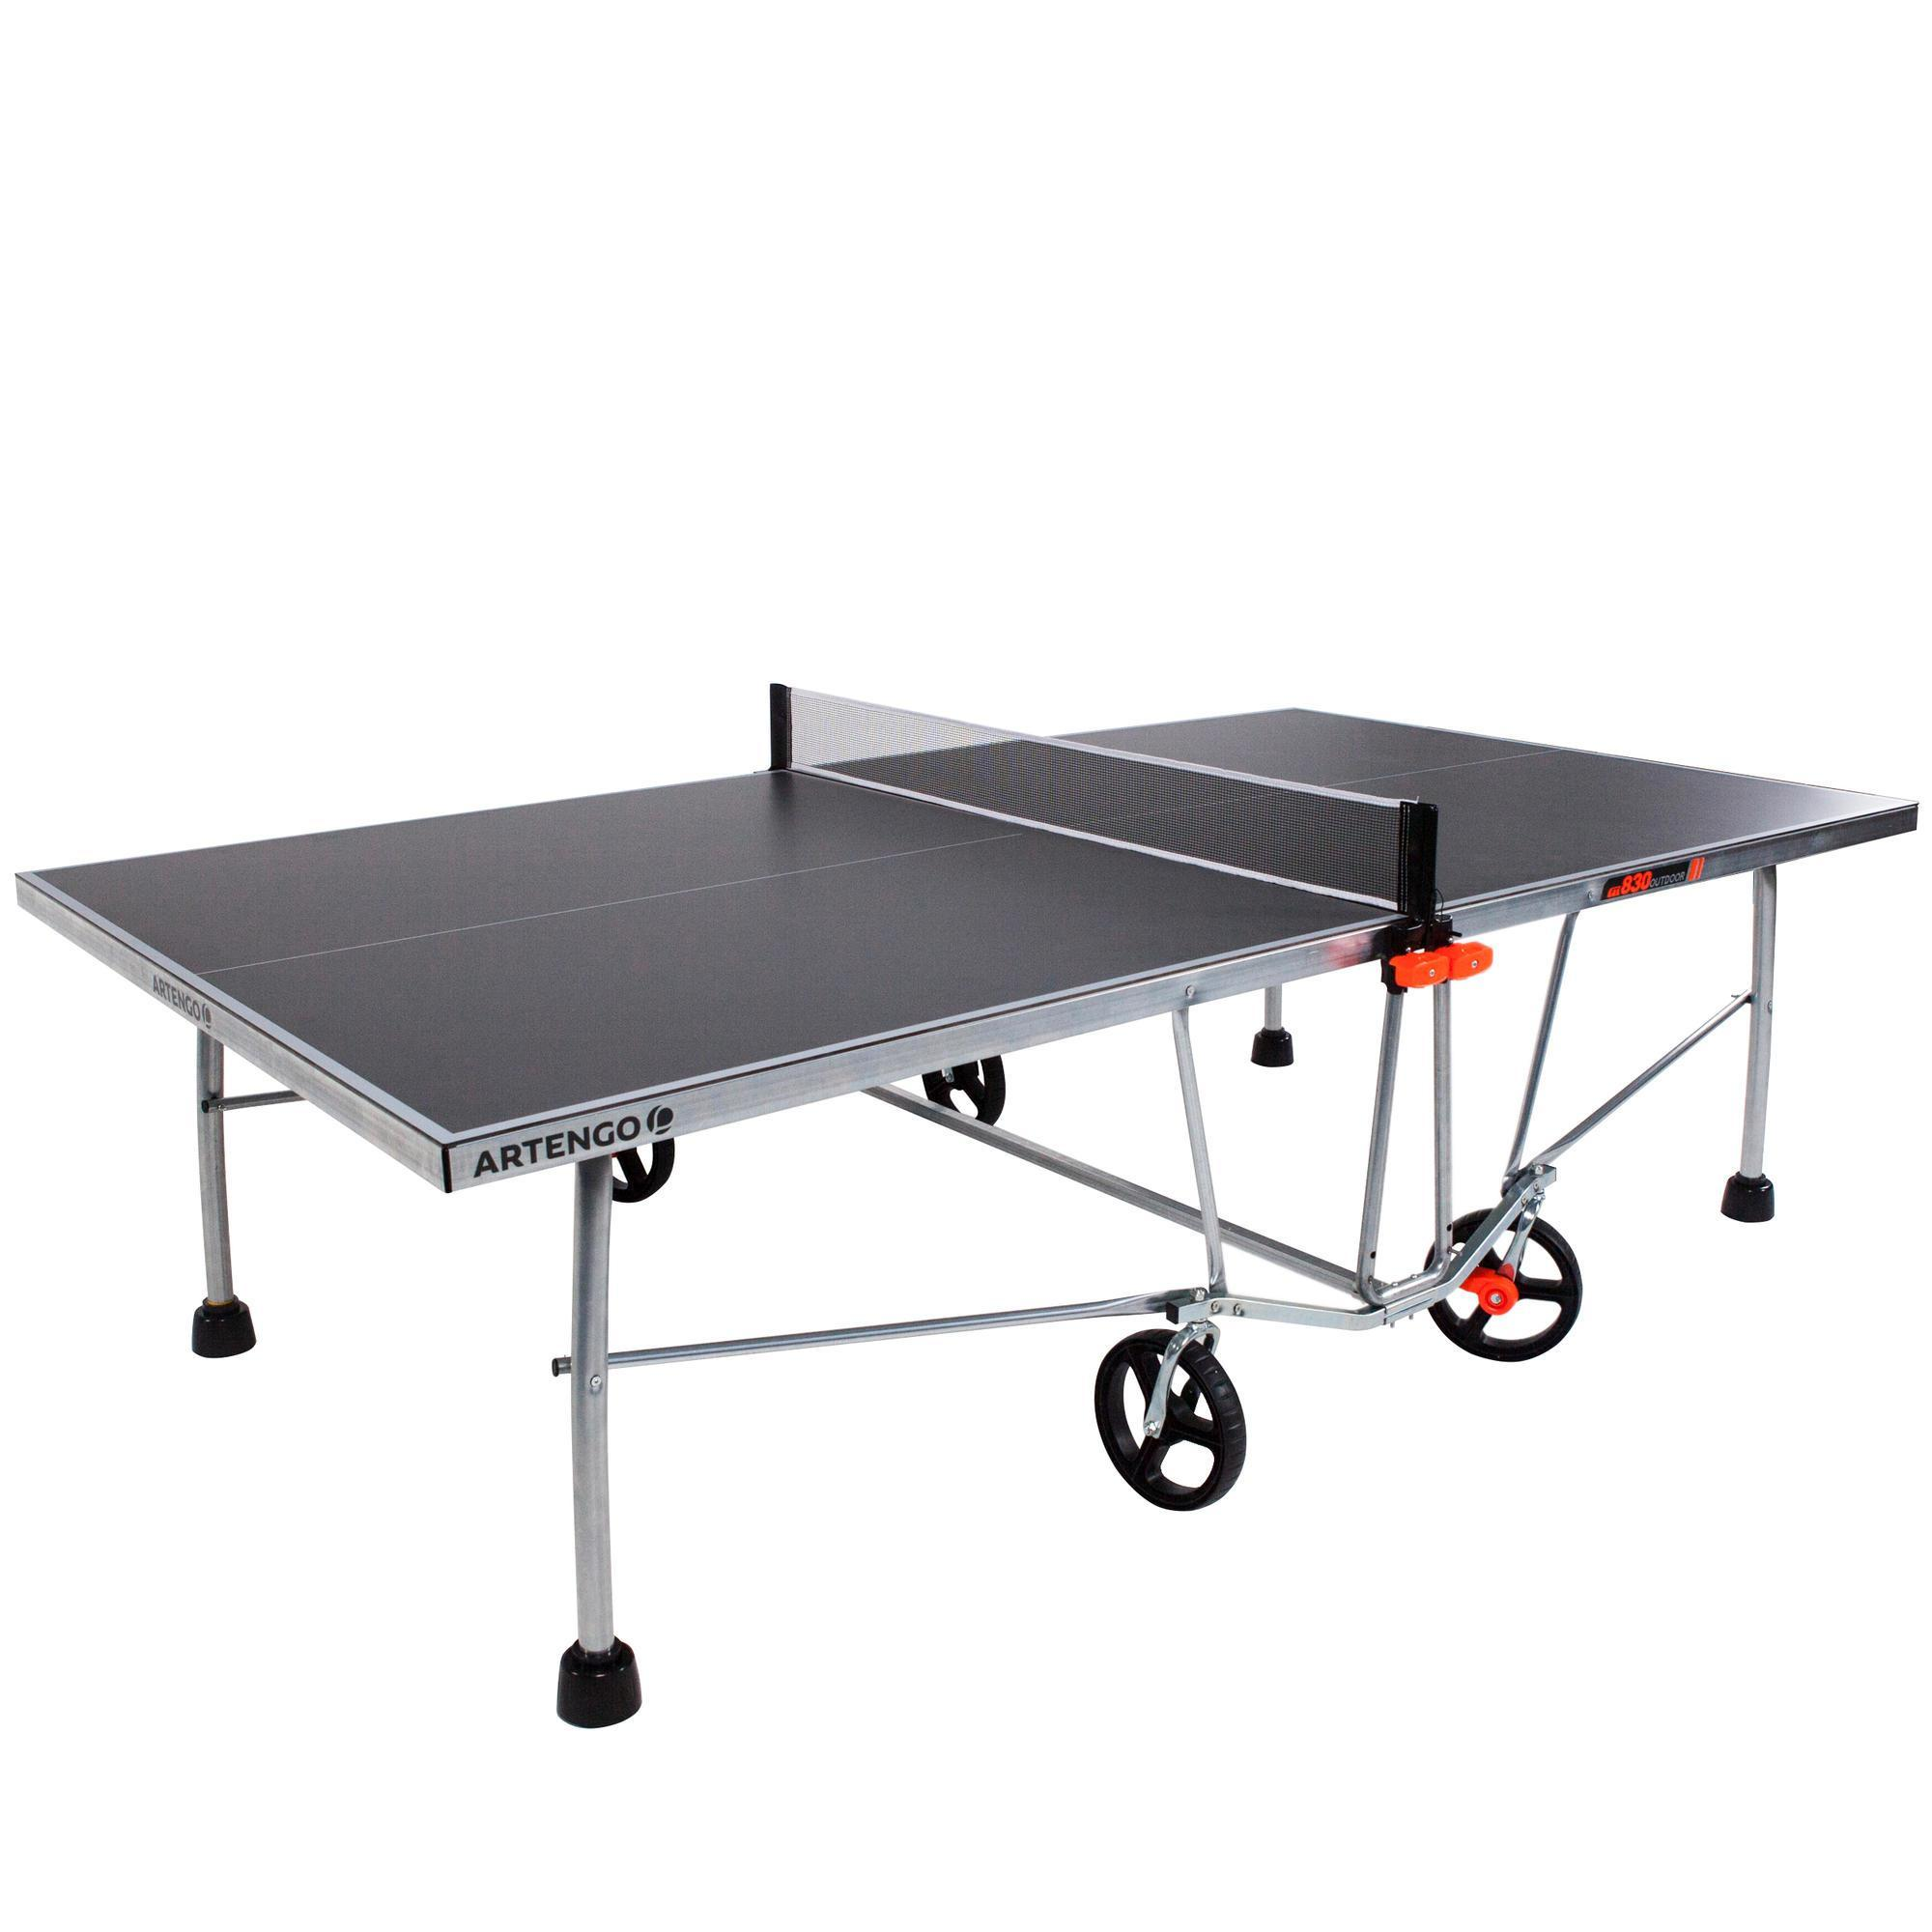 ft830 outdoor table tennis table artengo. Black Bedroom Furniture Sets. Home Design Ideas